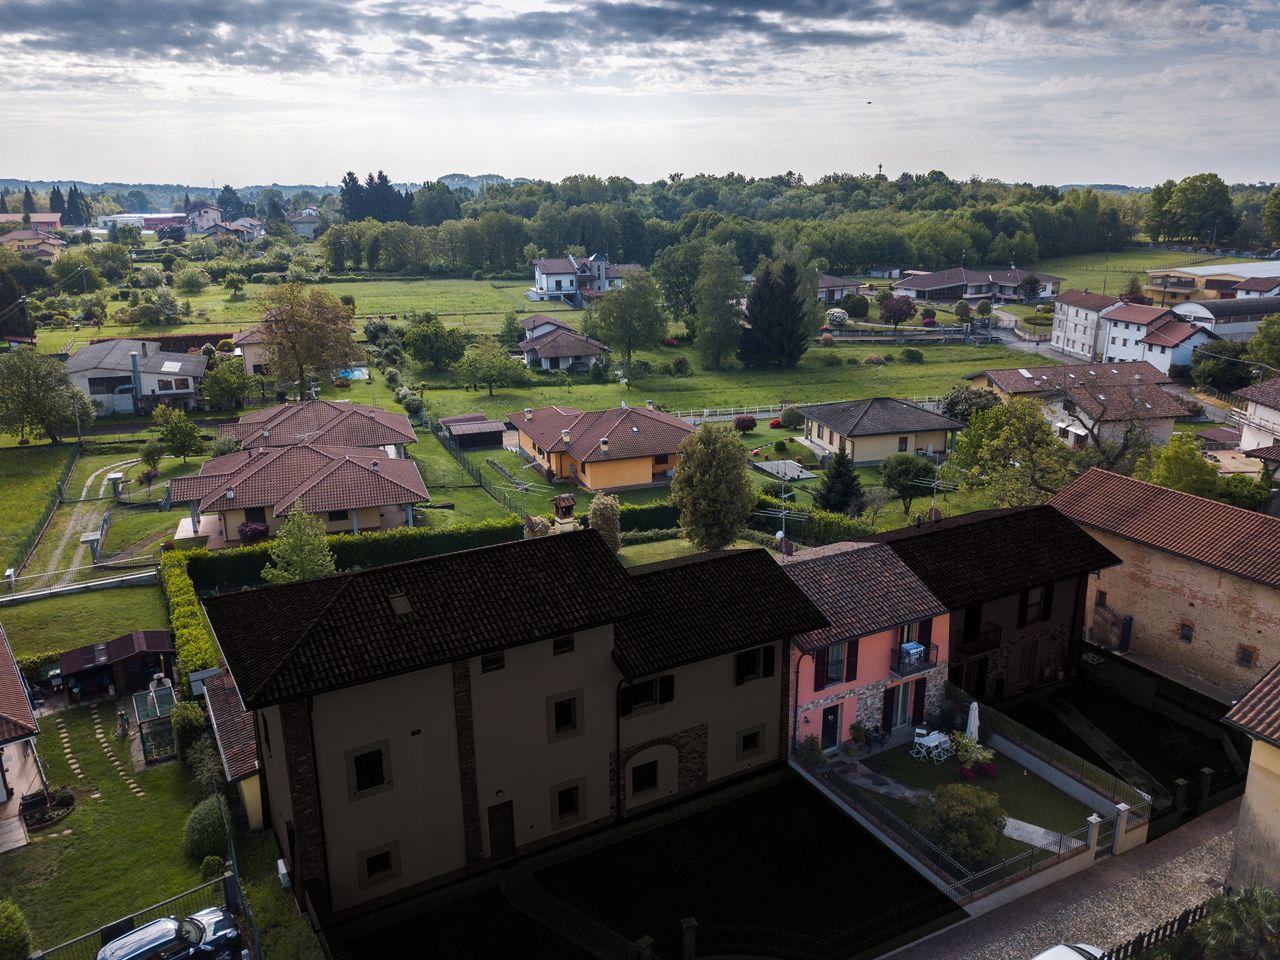 vista aerea - villetta - giardino